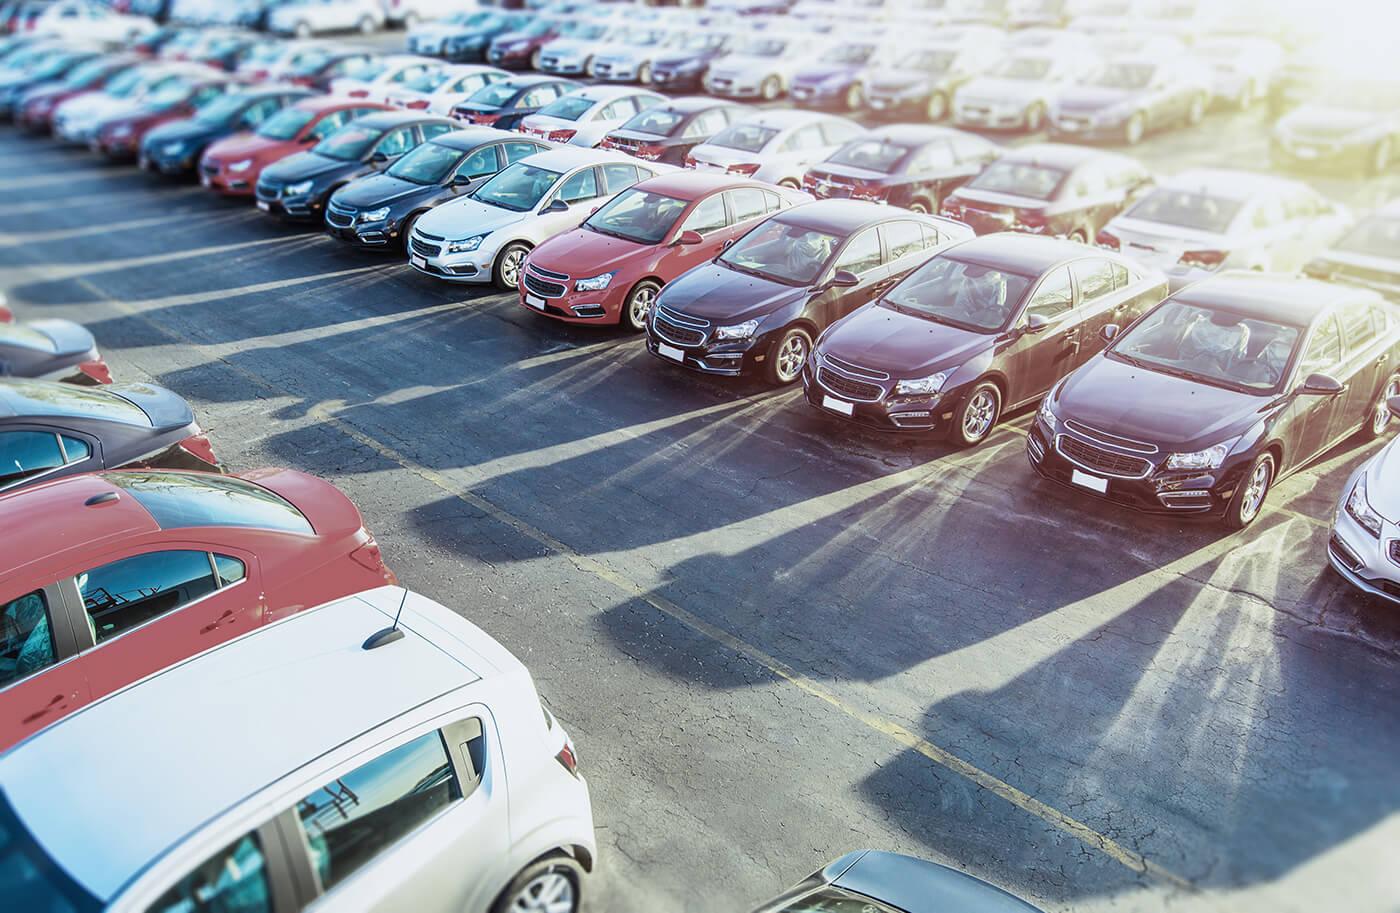 Betroffene Fahrzeuge Im Diesel Abgasskandal Alle Modelle